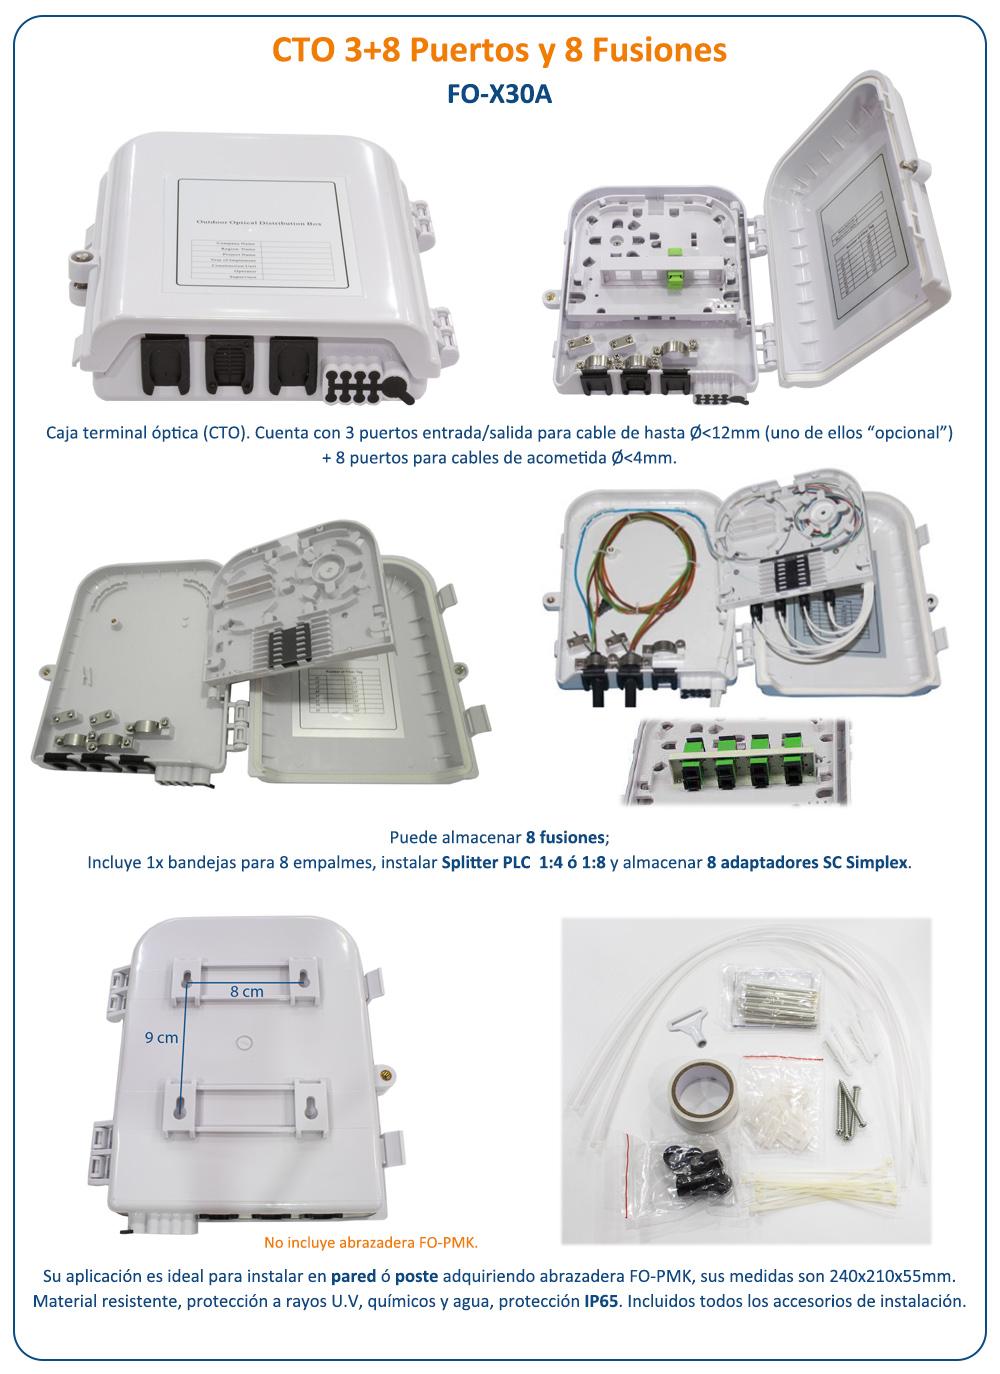 comp-X30A.jpg